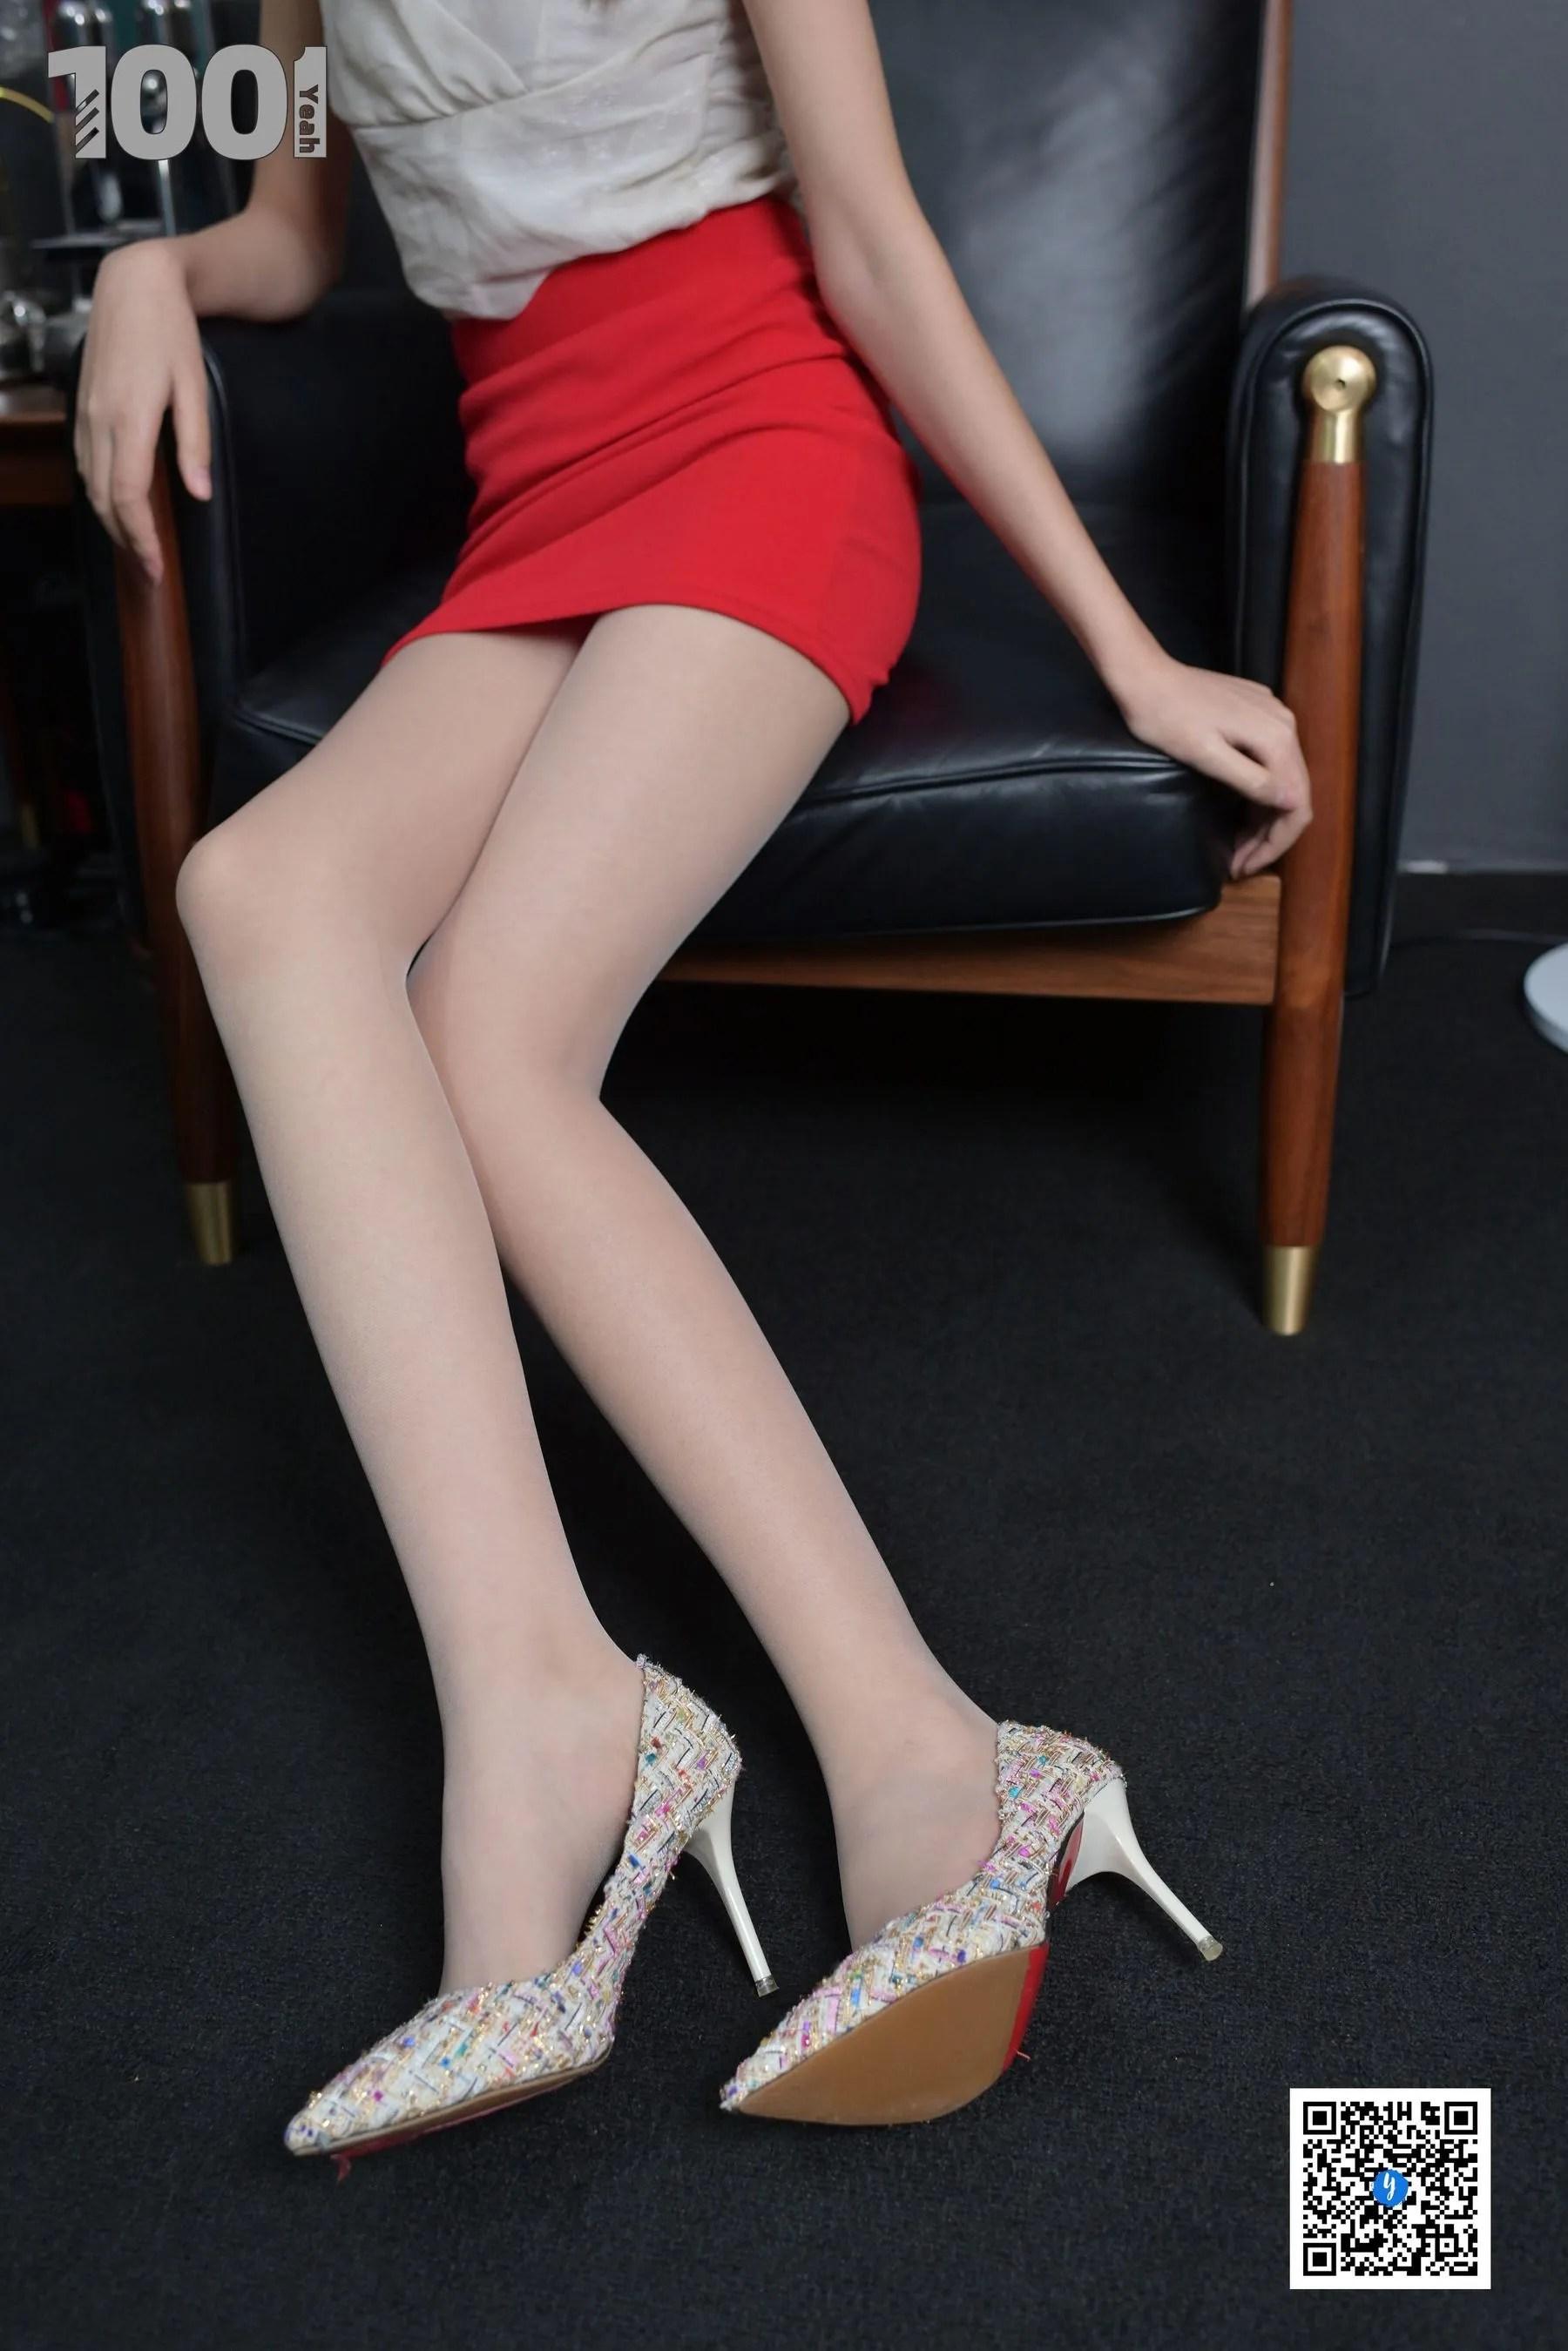 [IESS] NO.187 【一抹红】  丝袜美腿写真[87P]插图(1)